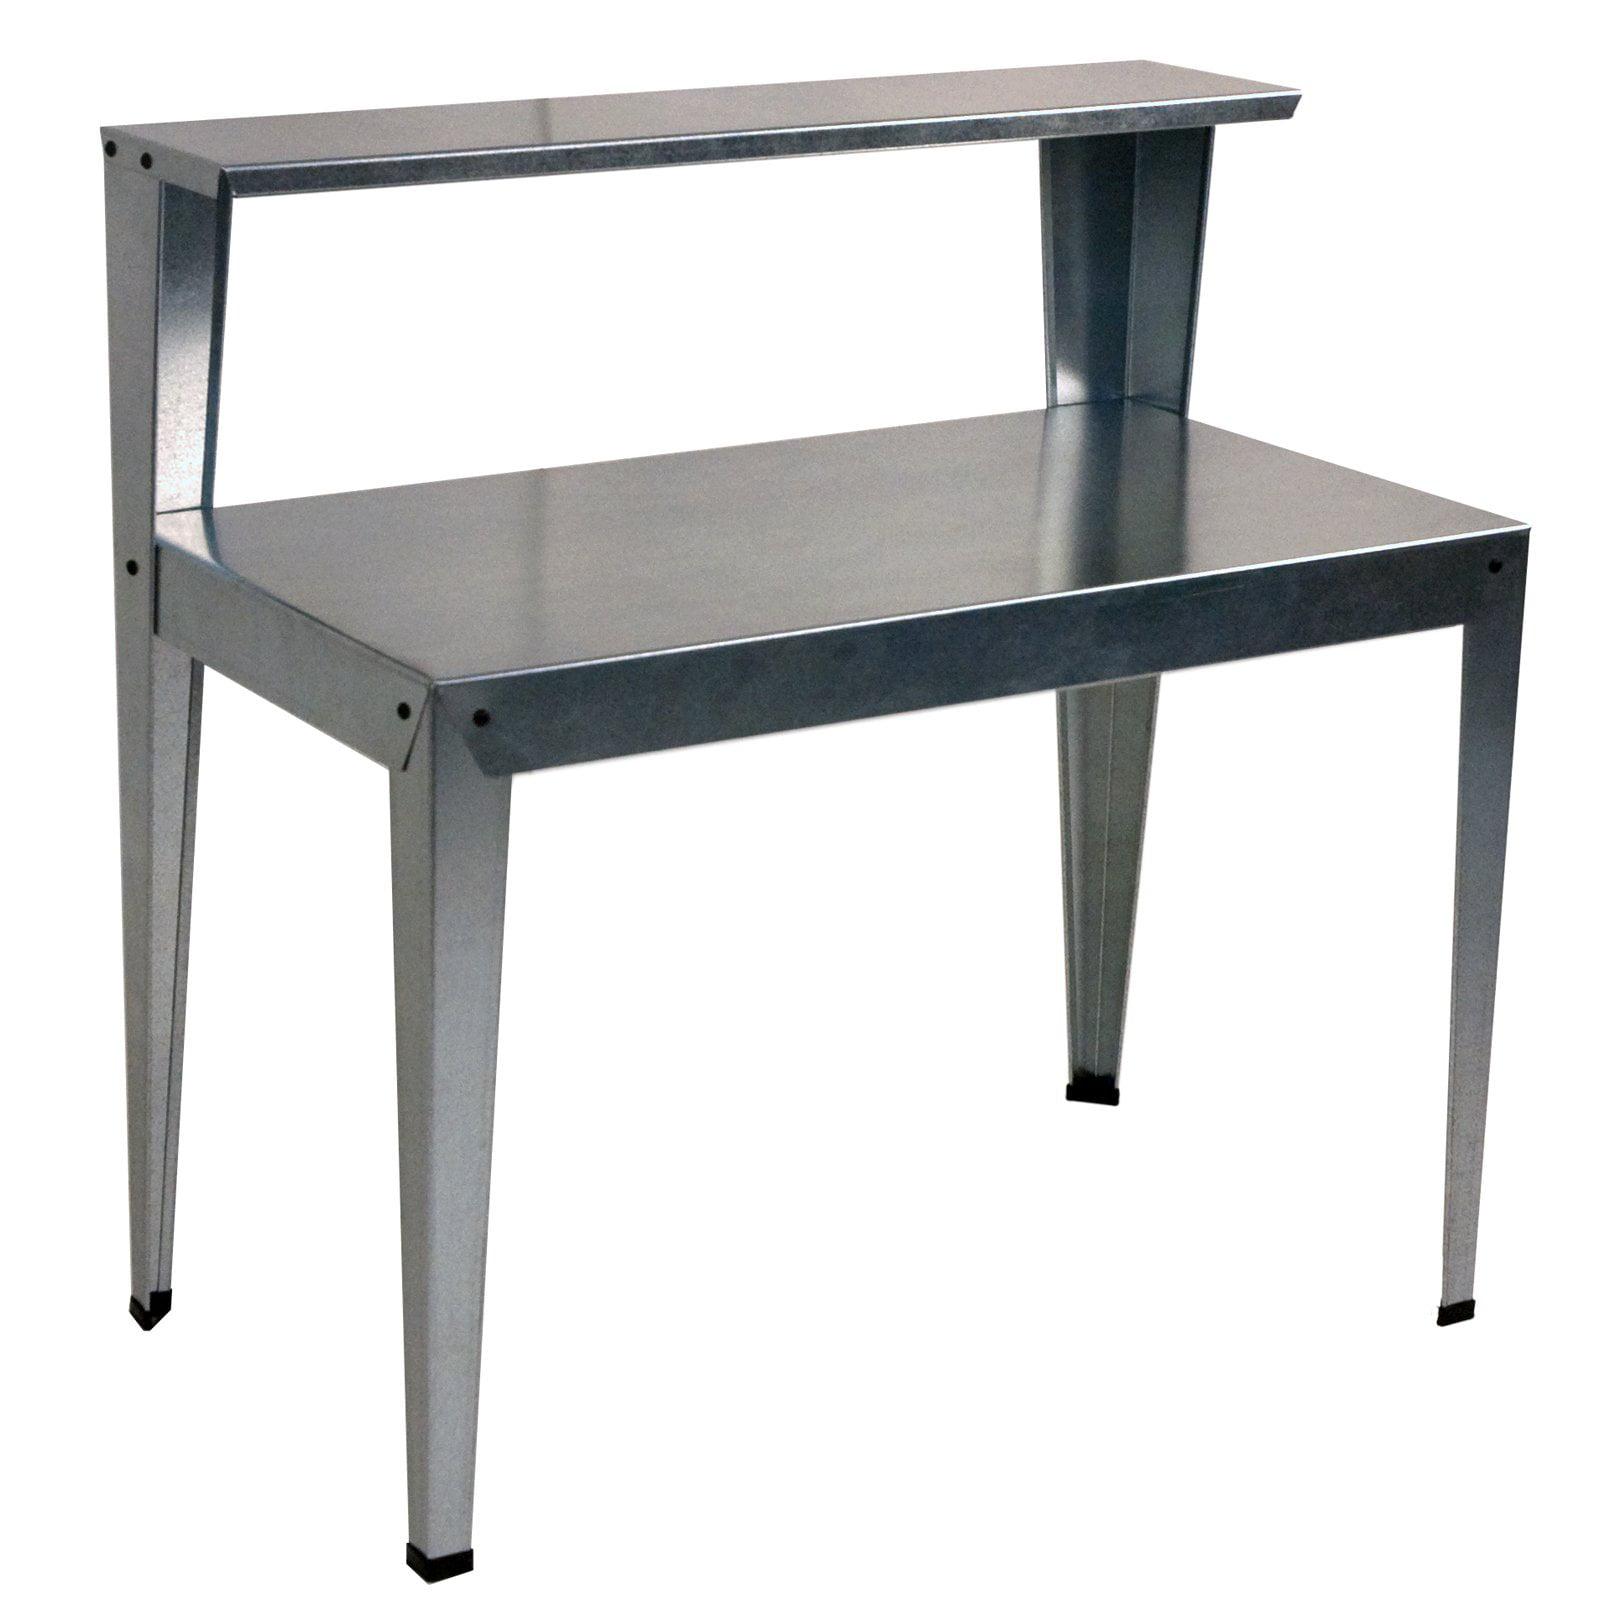 Galvanized Patio Furniture.Poly Tex 2 Tier Galvanized Steel Potting Bench